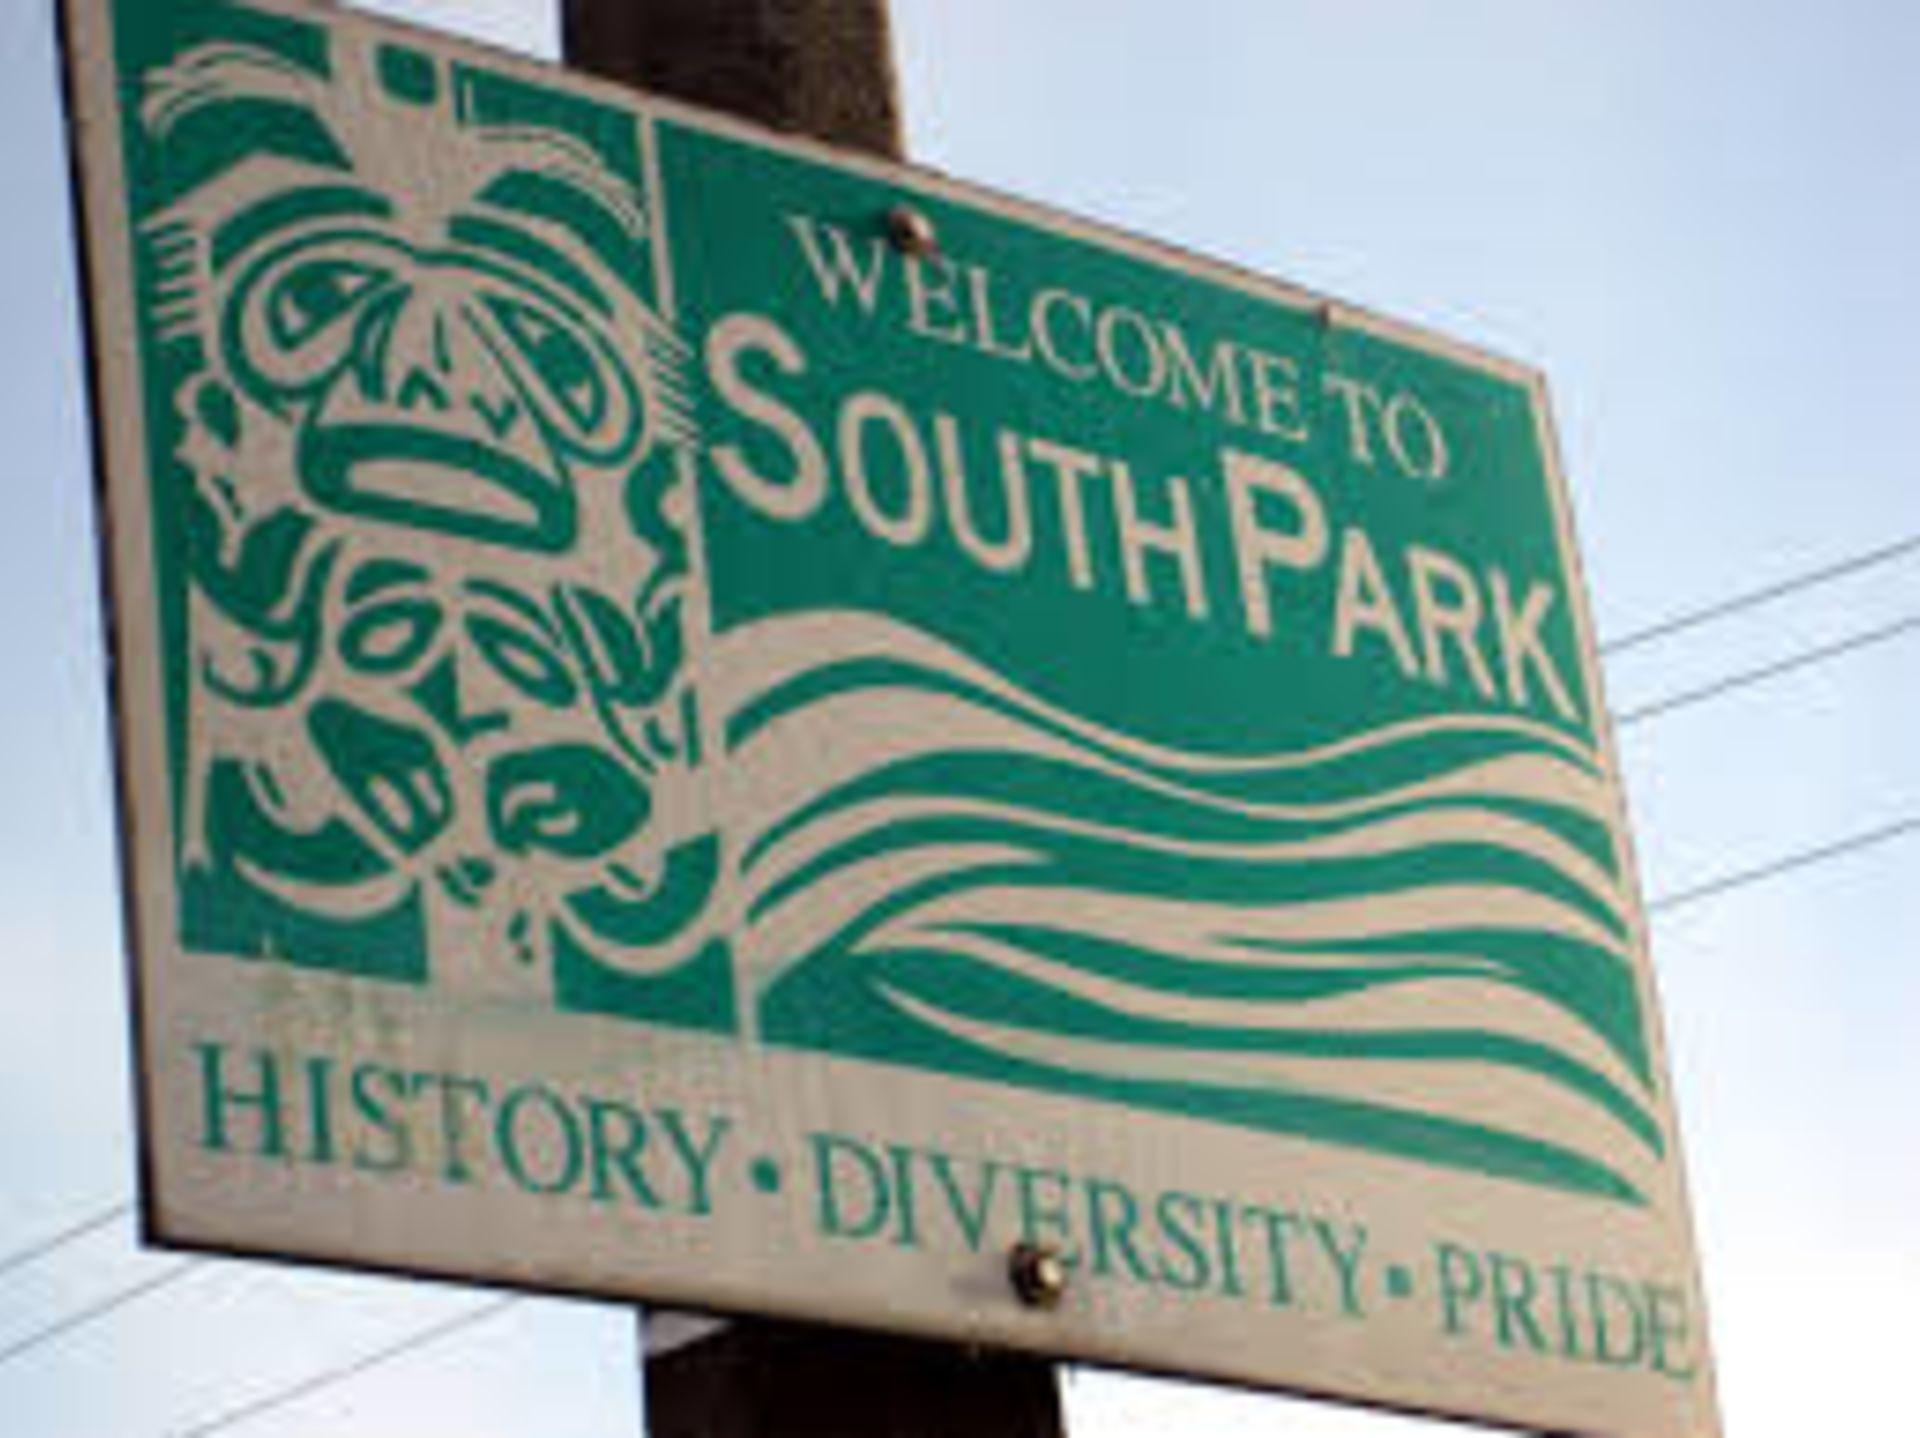 Neighborhood Profile: South Park